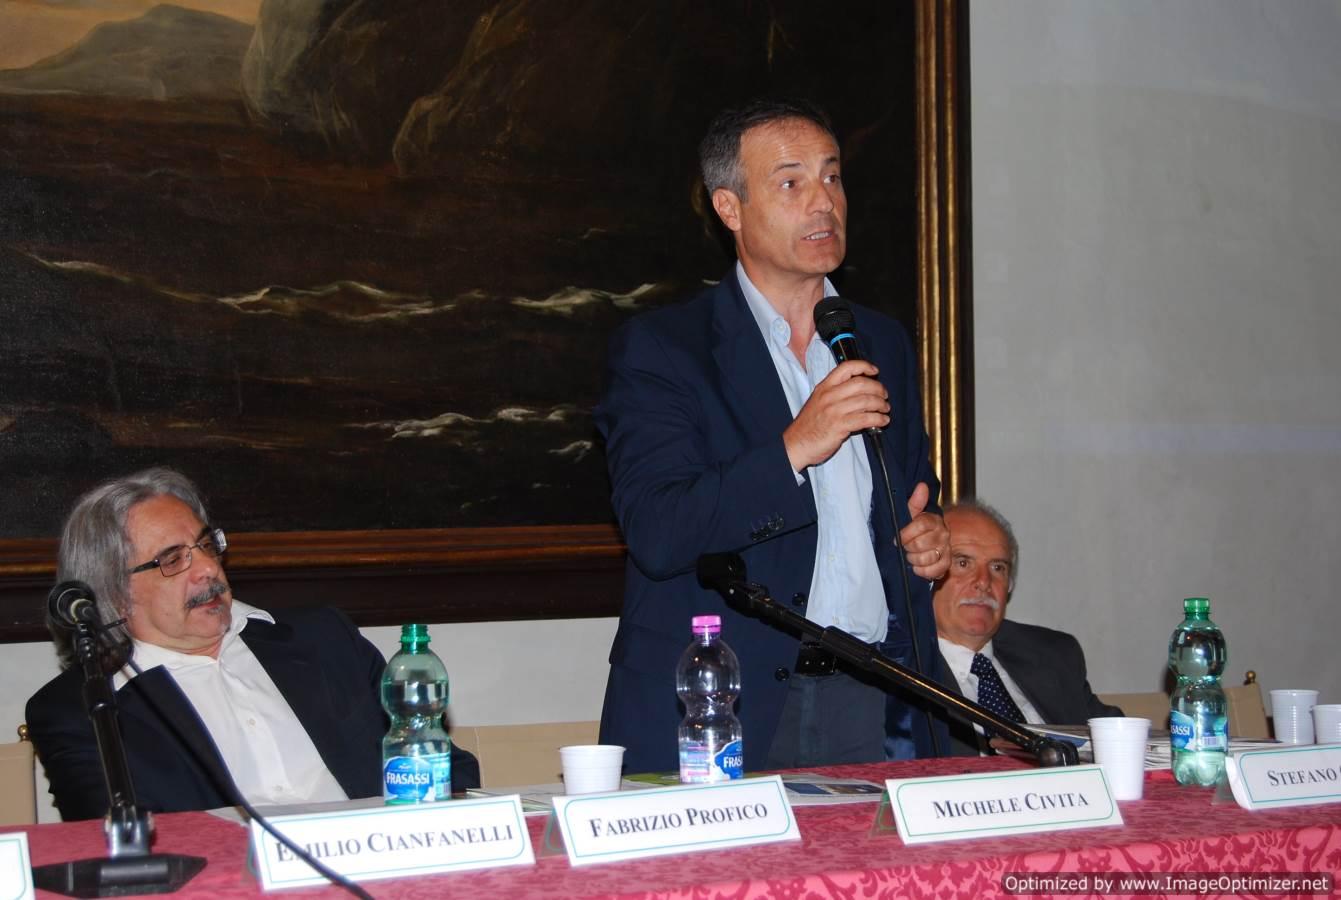 Michele Civita Ariccia